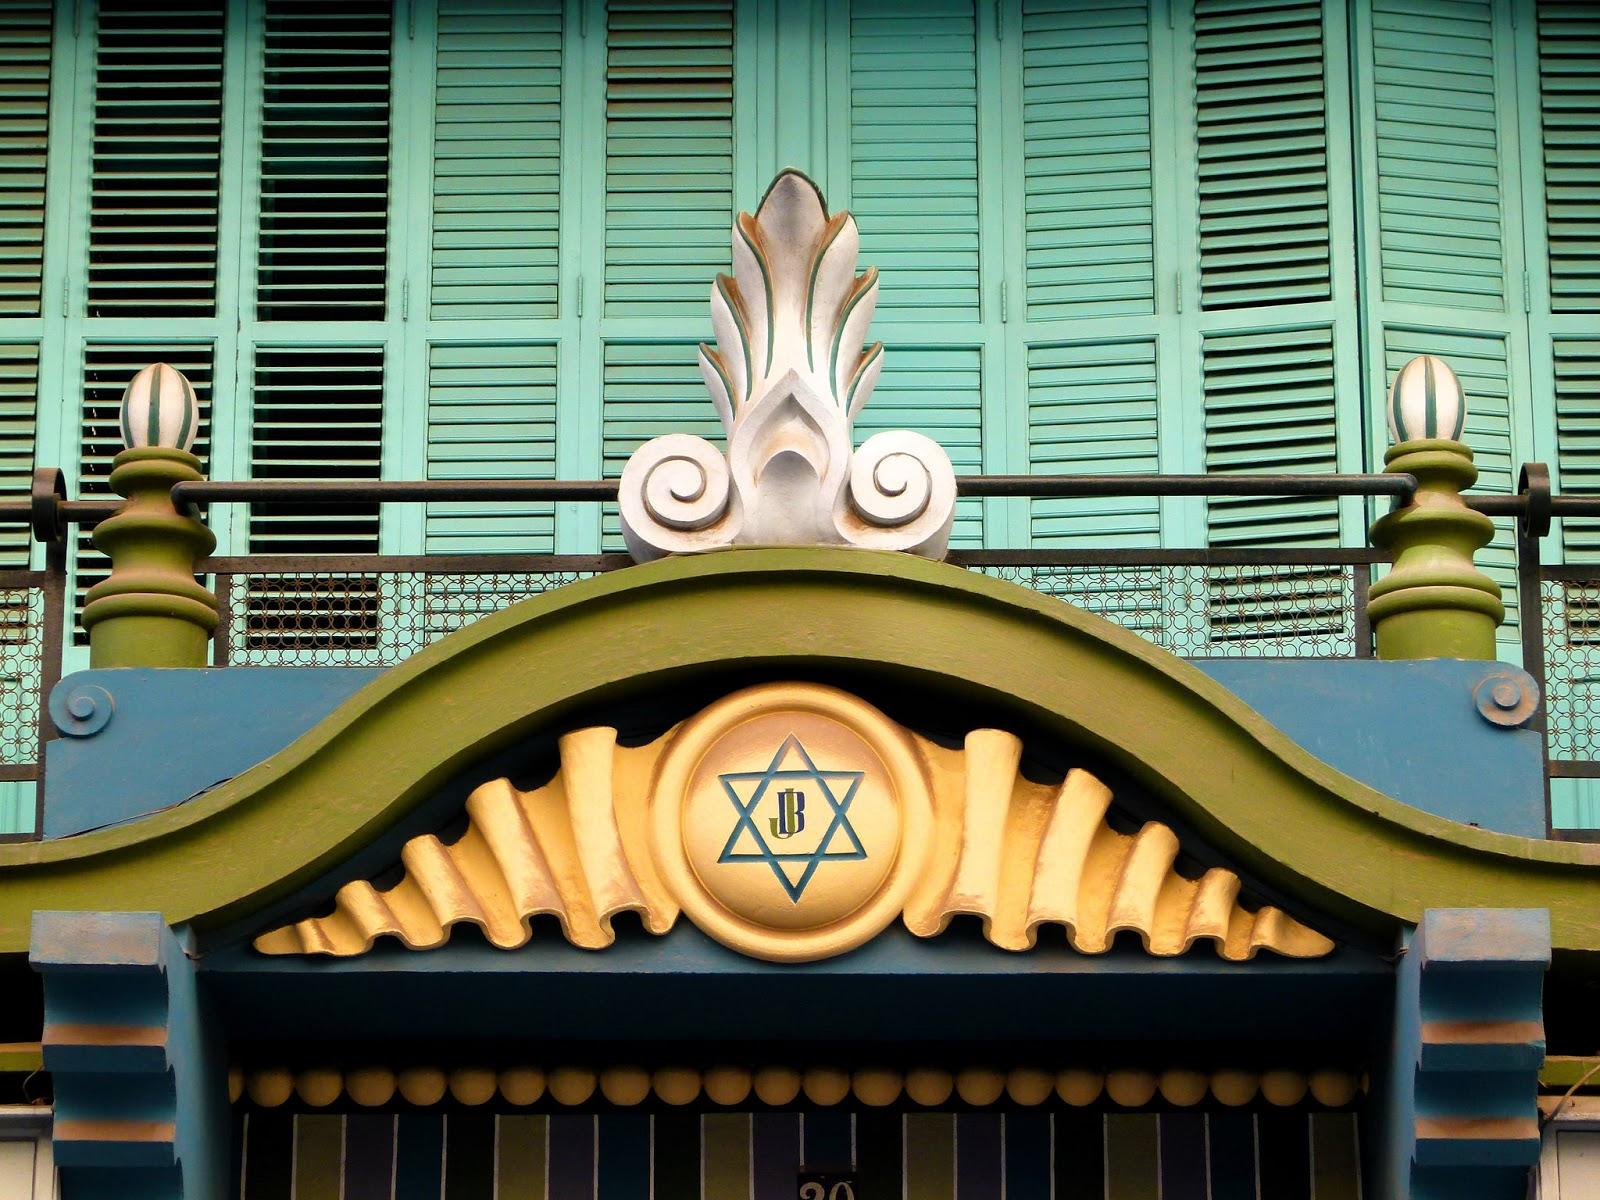 Casa jud a en la calle castell n 20 de valencia obra de for Decoracion casa judia